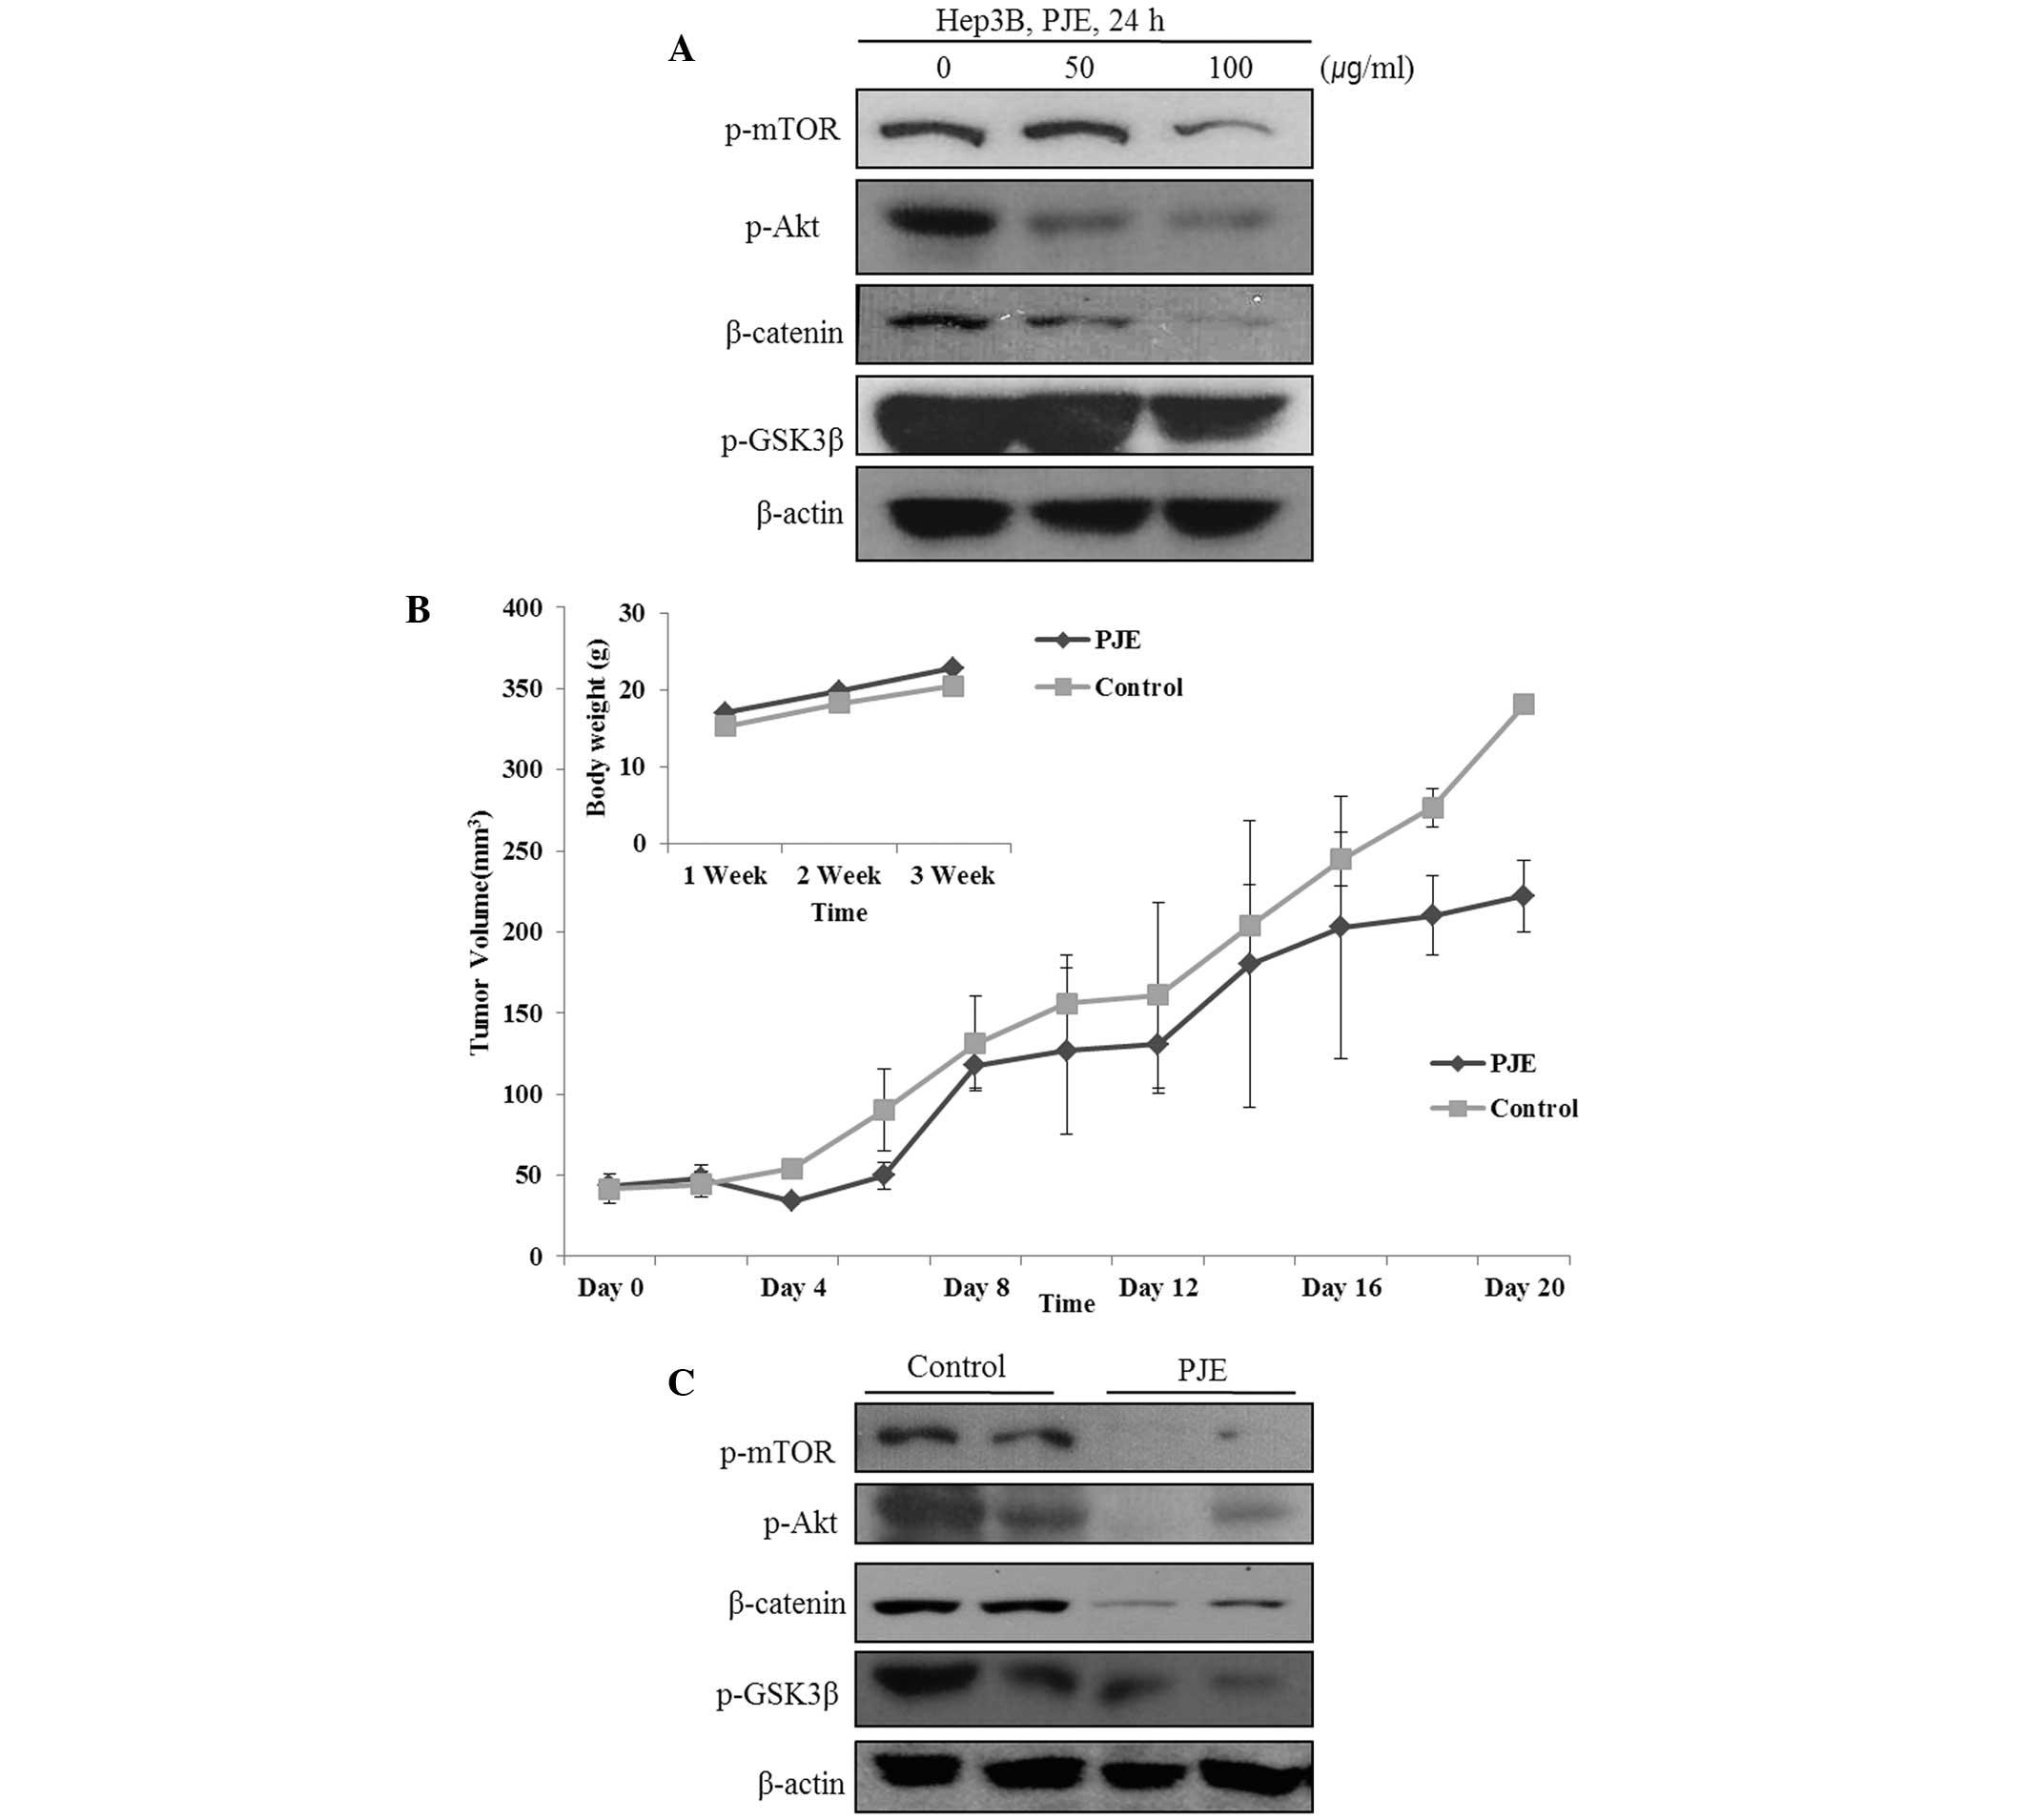 SH exerts in vivo anticancer effect on HCC xenograft model